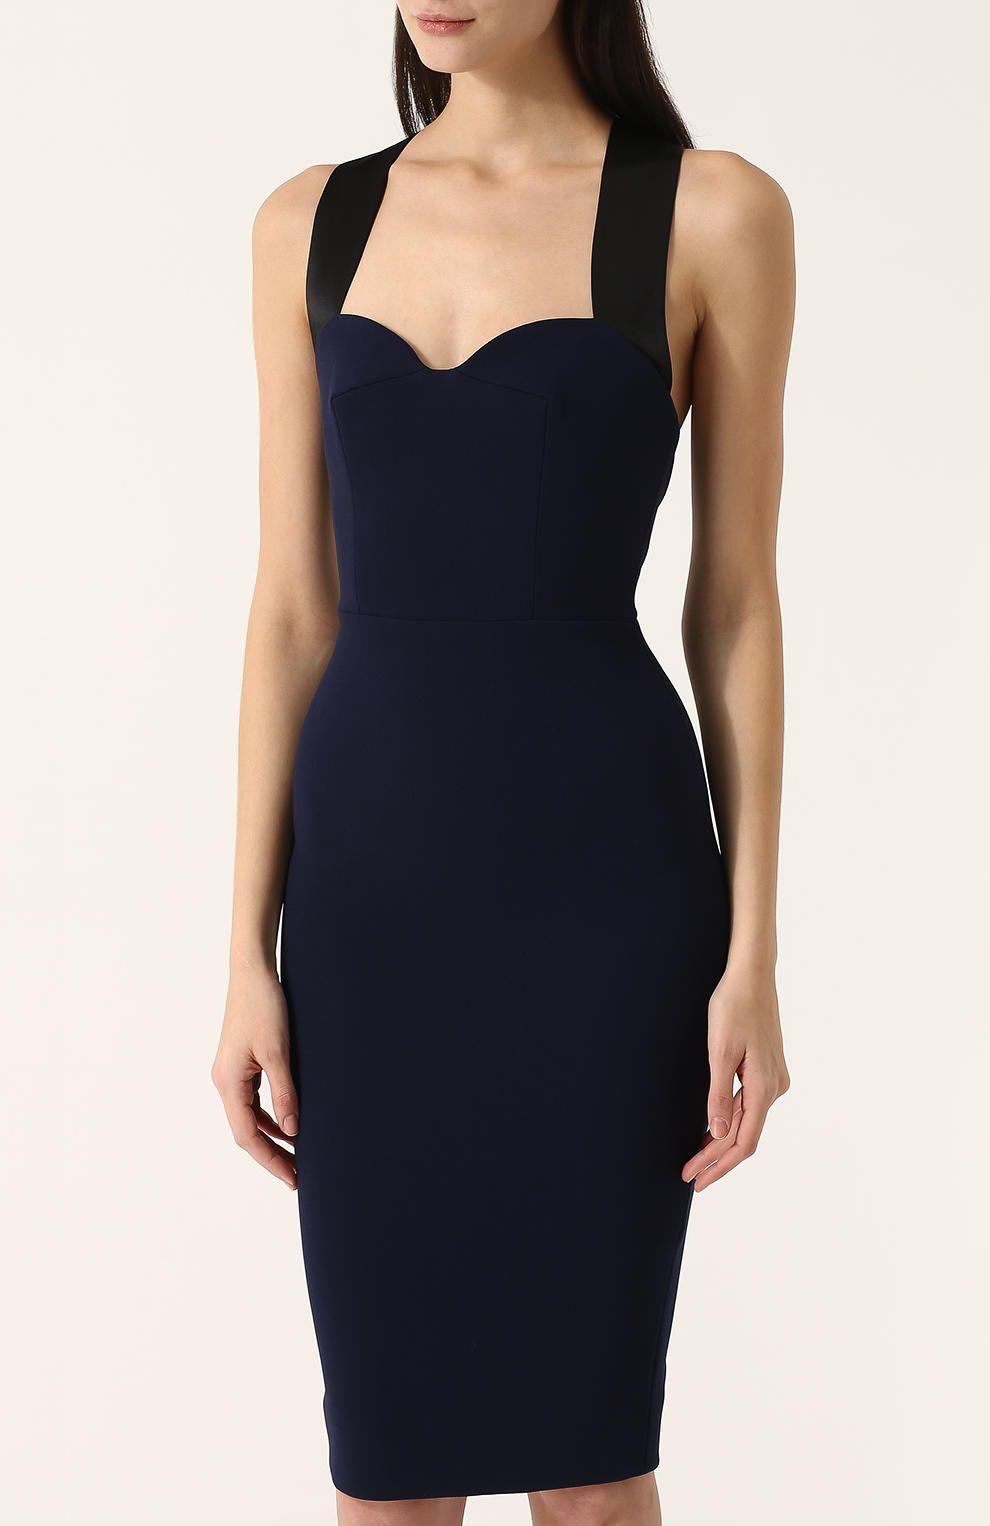 8ae8edebf4aab36 Женское темно-синее платье-футляр с широкими лямками Victoria Beckham,  сезон SS 2018, арт. DR FIT 6337 PSS18 MATT CREPE купить в ЦУМ | Фото №3